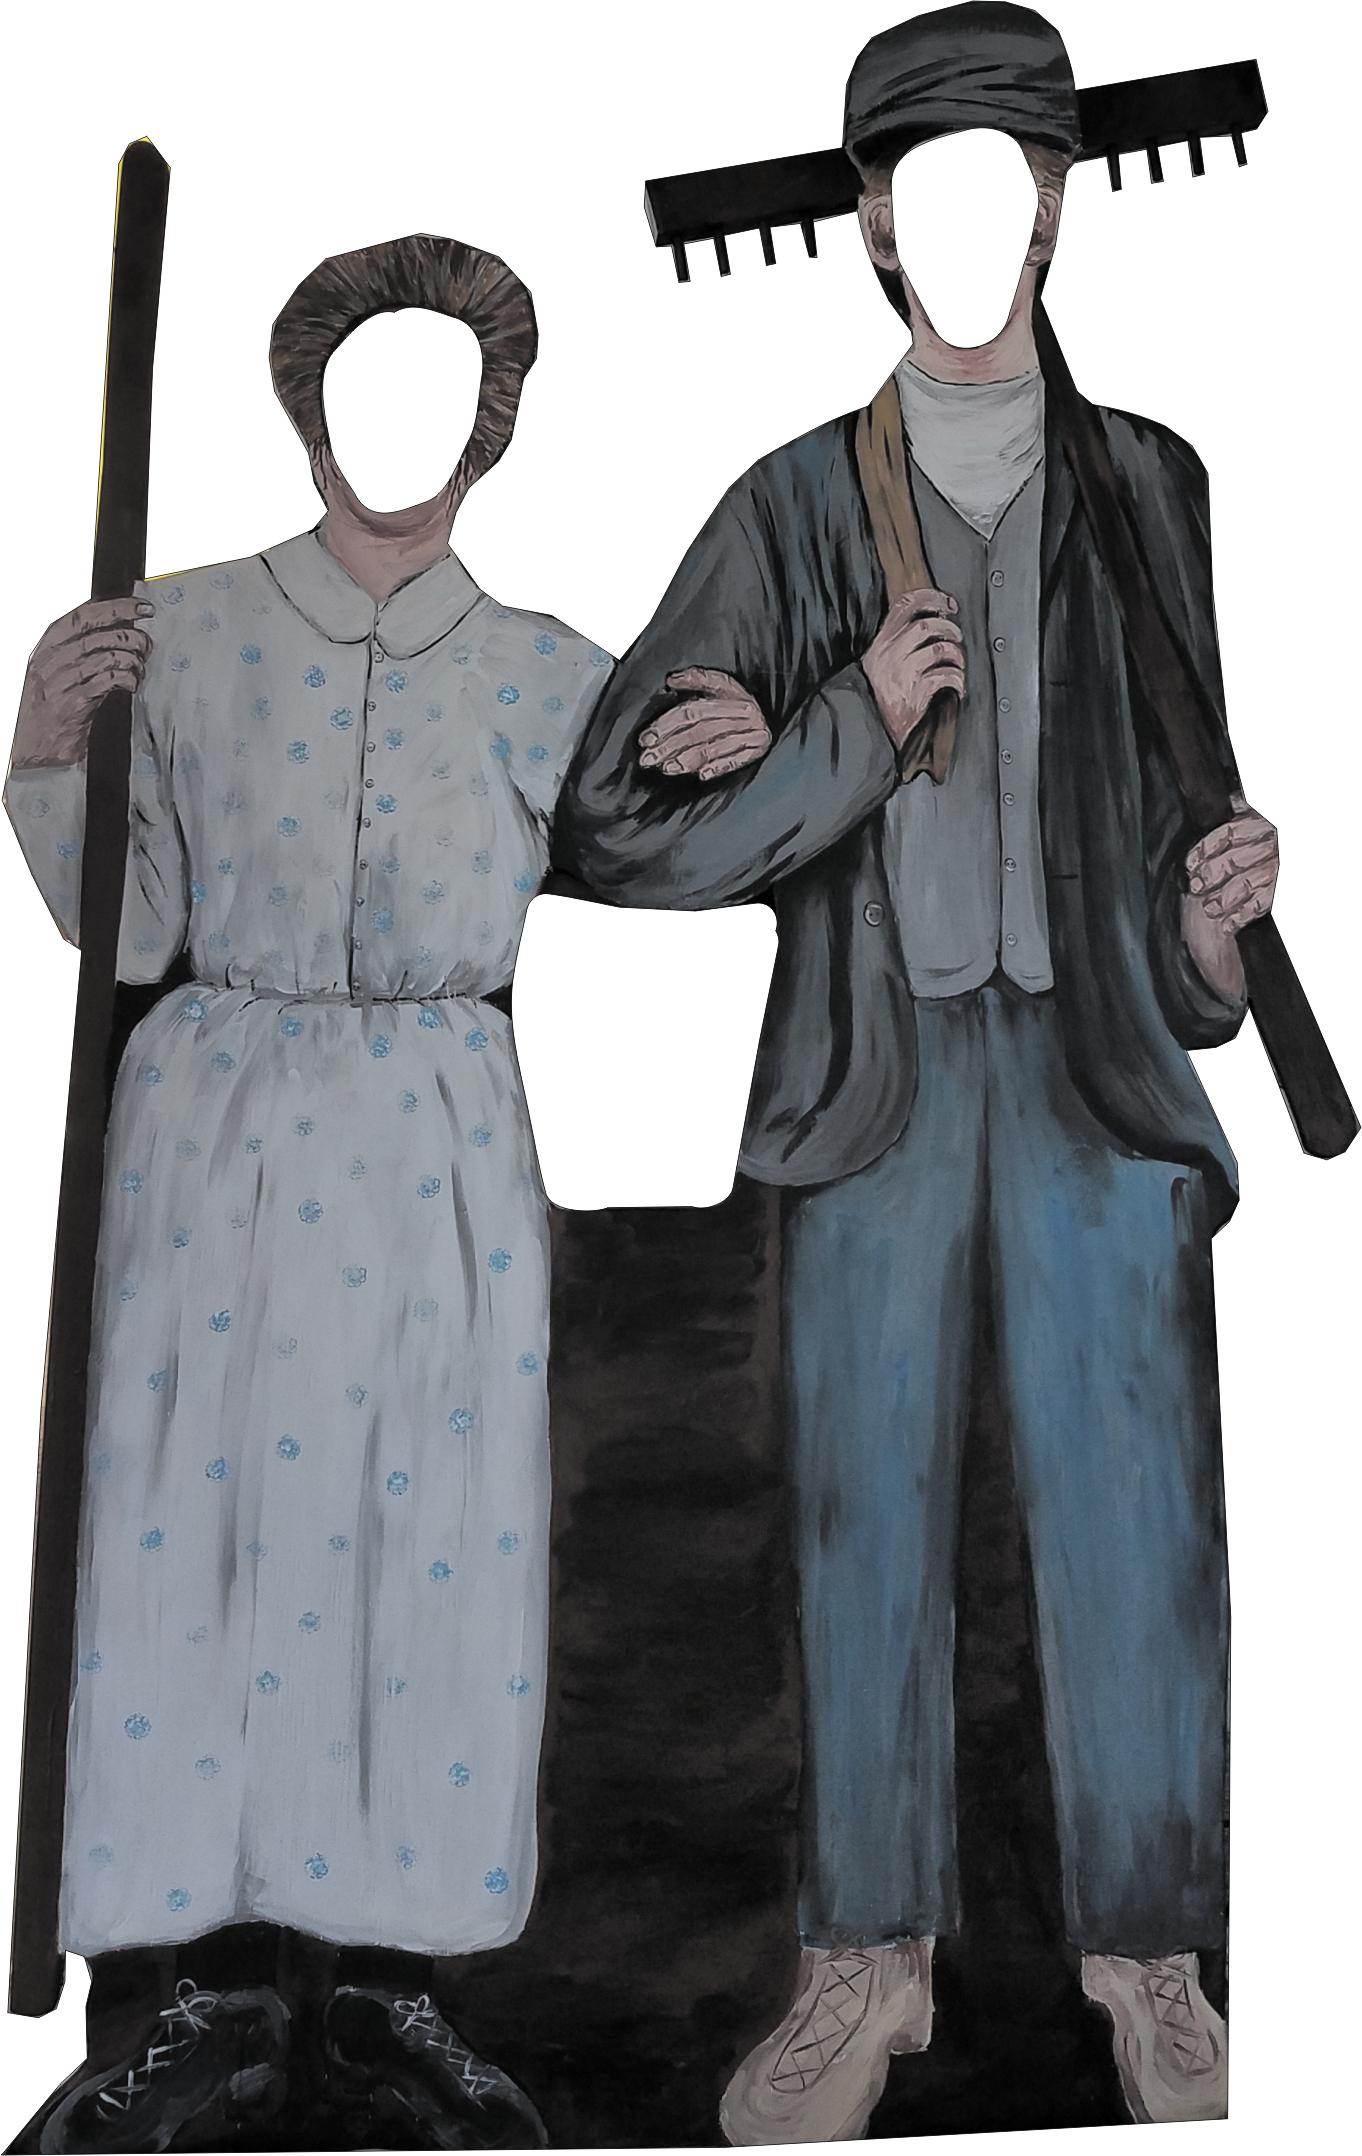 Elderly farming couple